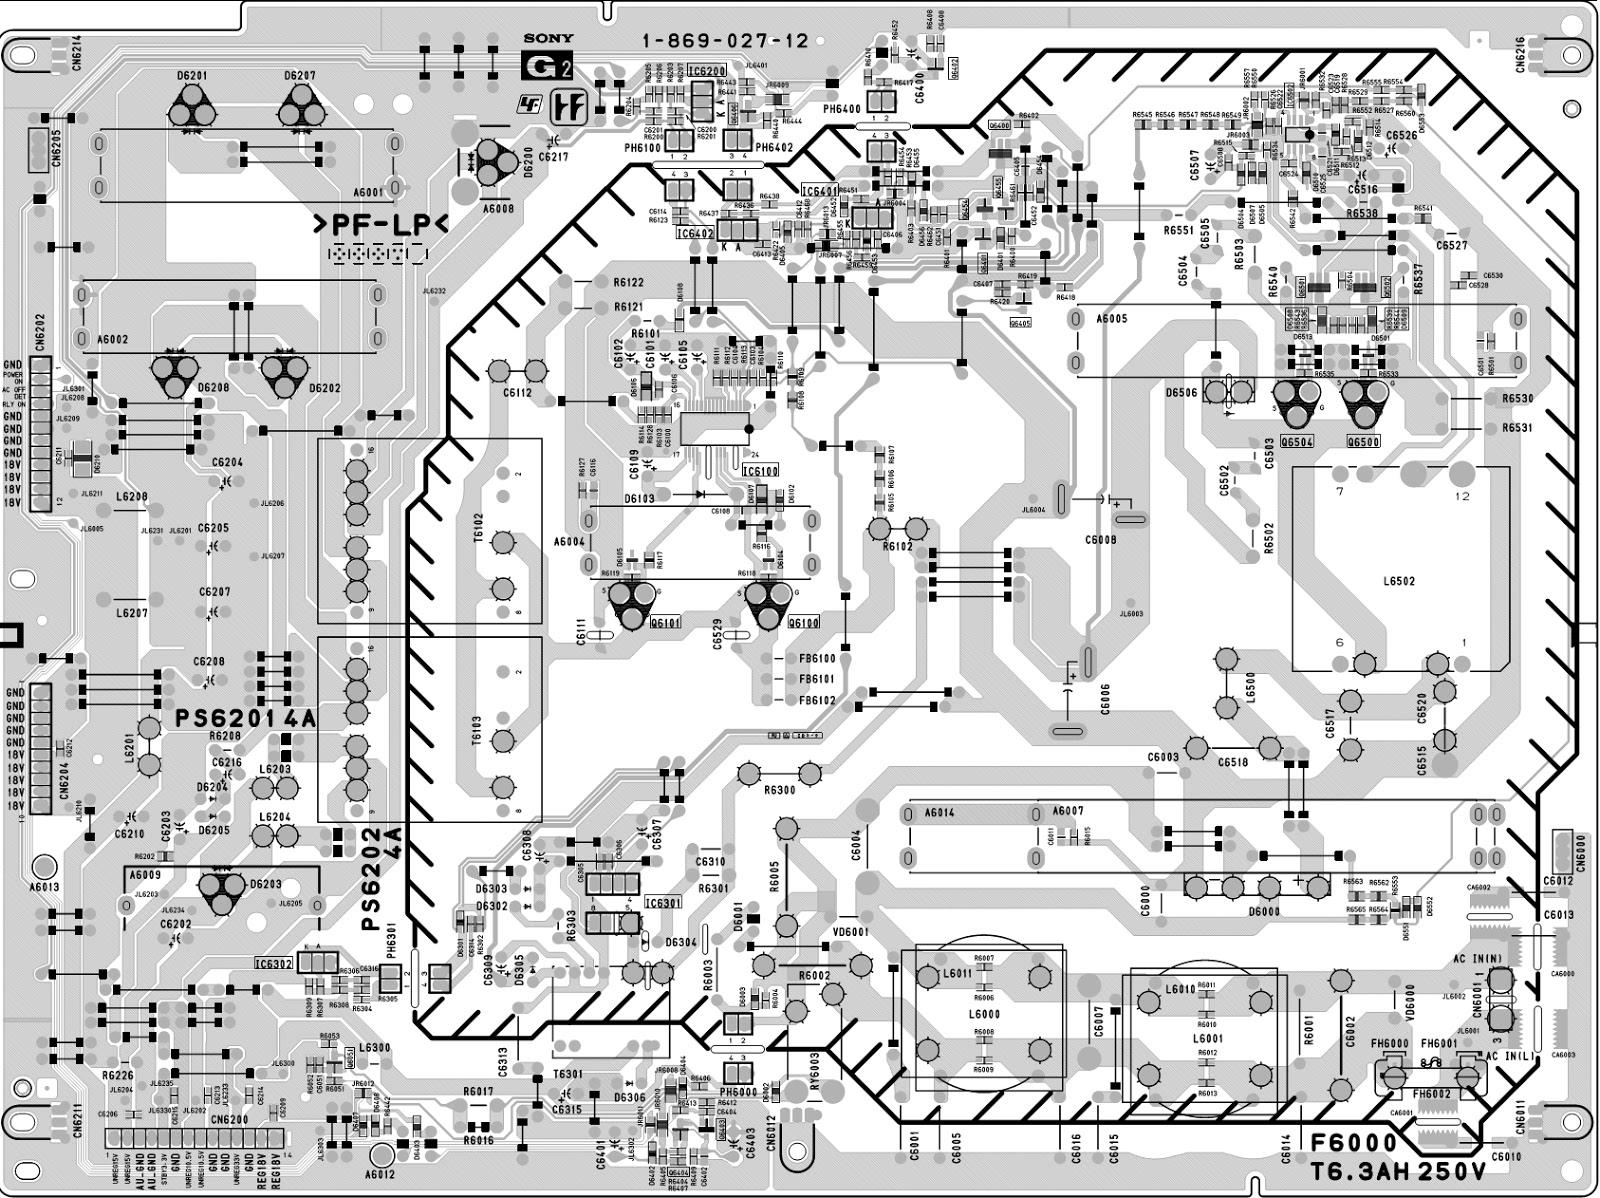 Sony Kdl40s2000 - Kdl32s2000